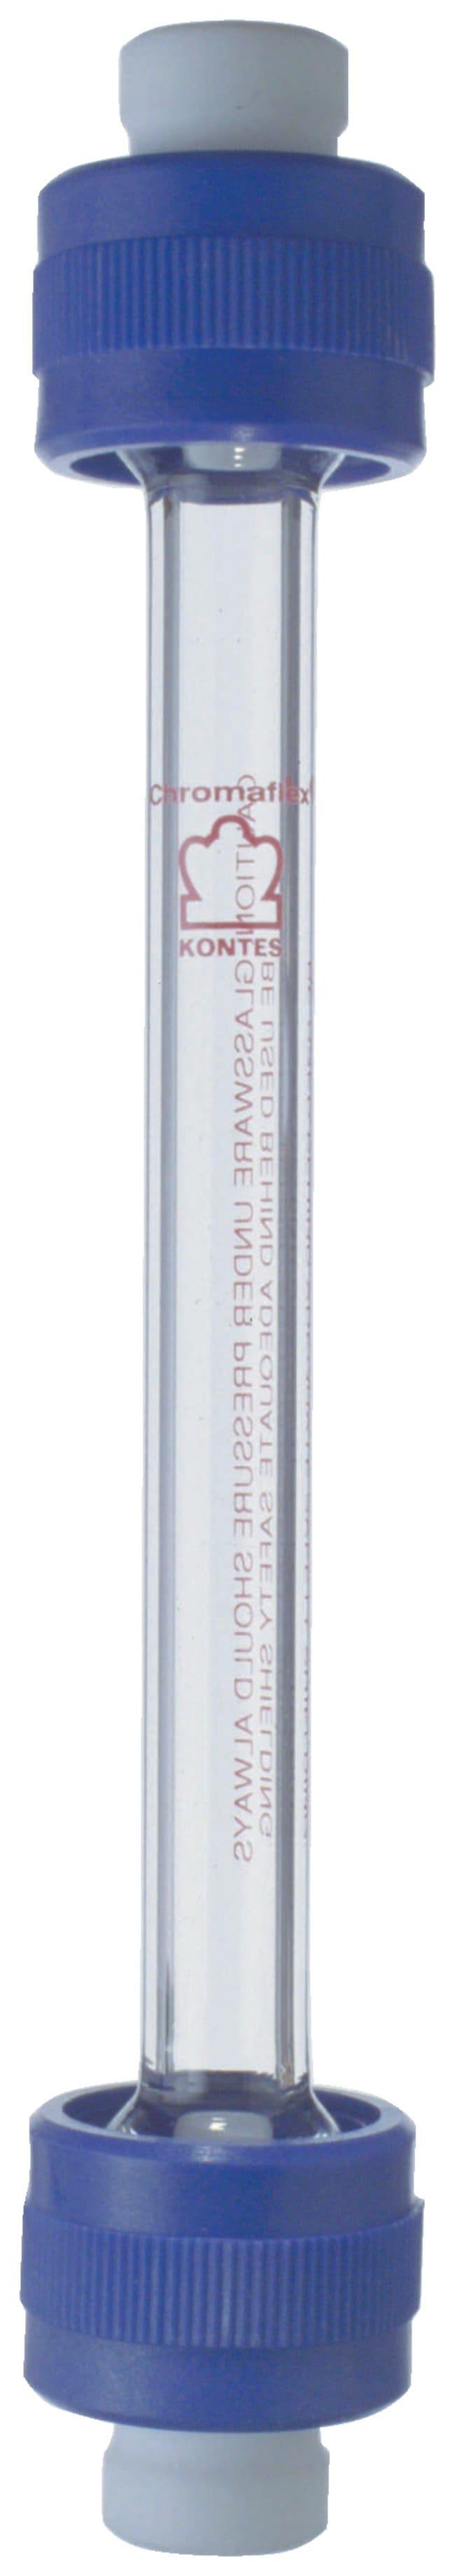 DWK Life SciencesKimble™ Kontes™ Chromaflex™ Columns 15L x 4.8cm I.D.; 271mL maximum volume DWK Life SciencesKimble™ Kontes™ Chromaflex™ Columns